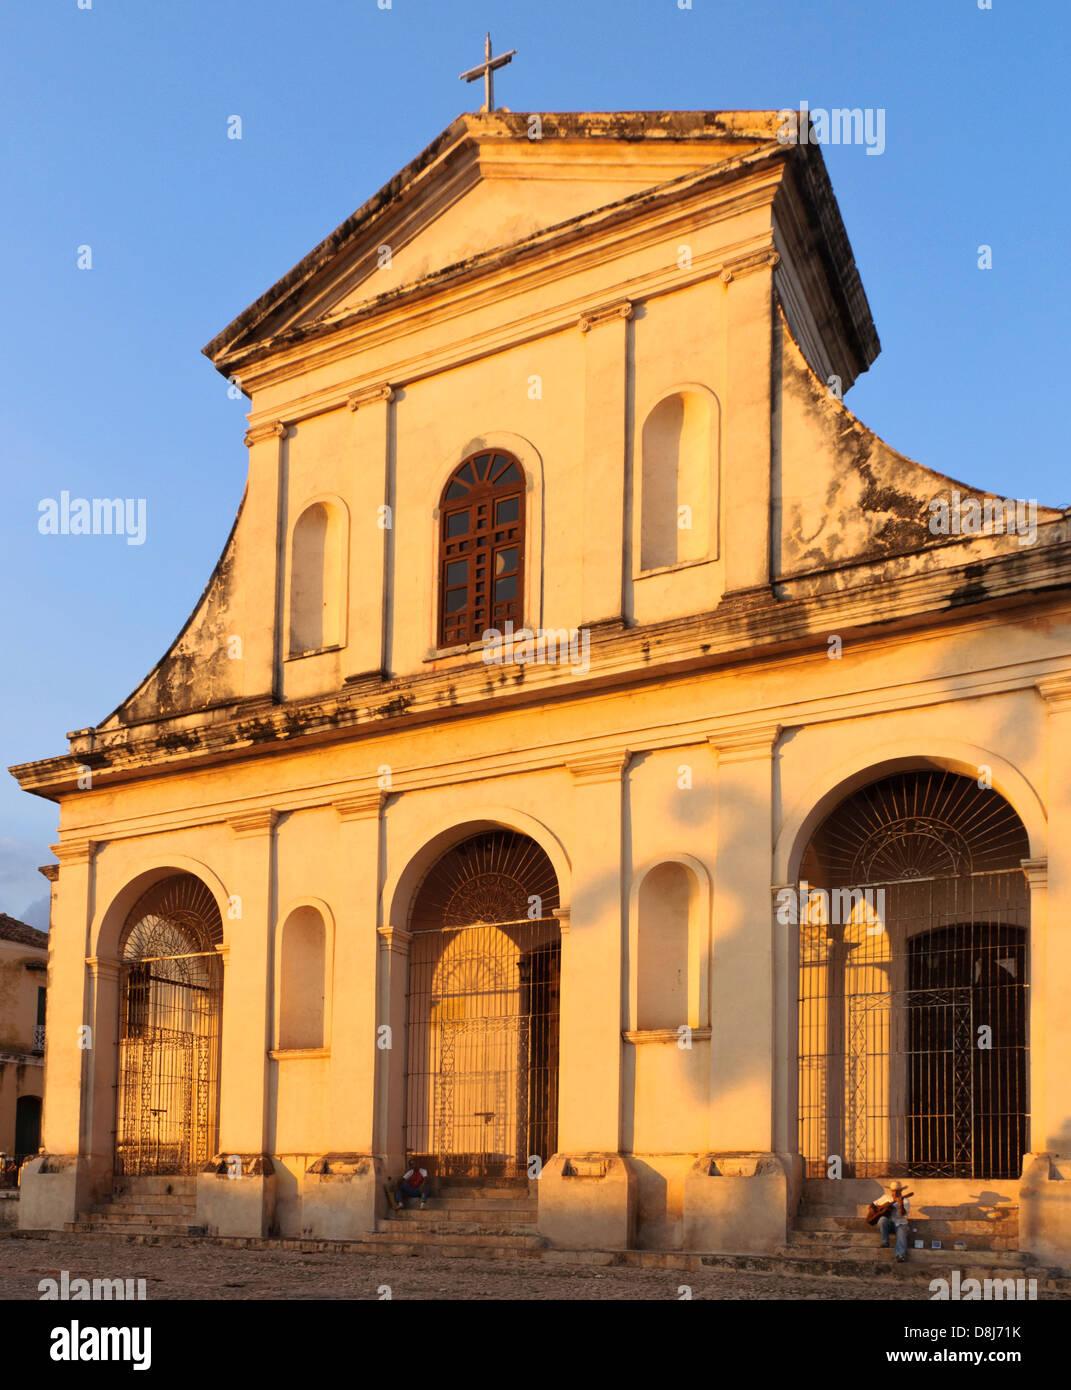 Iglesia Parroquial de la Santissima Trinidad, Trinidad, Cuba, Caribbean - Stock Image